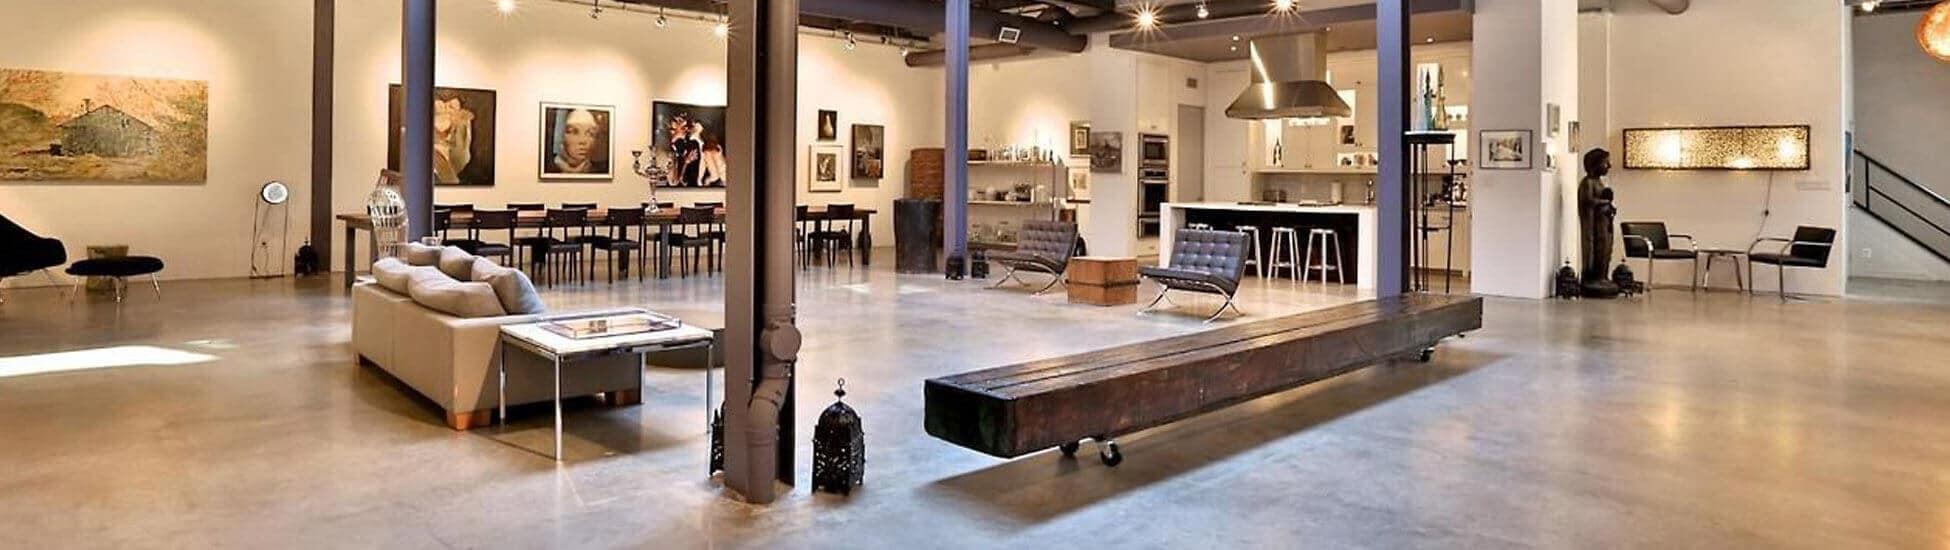 Warehouse renovations NYC